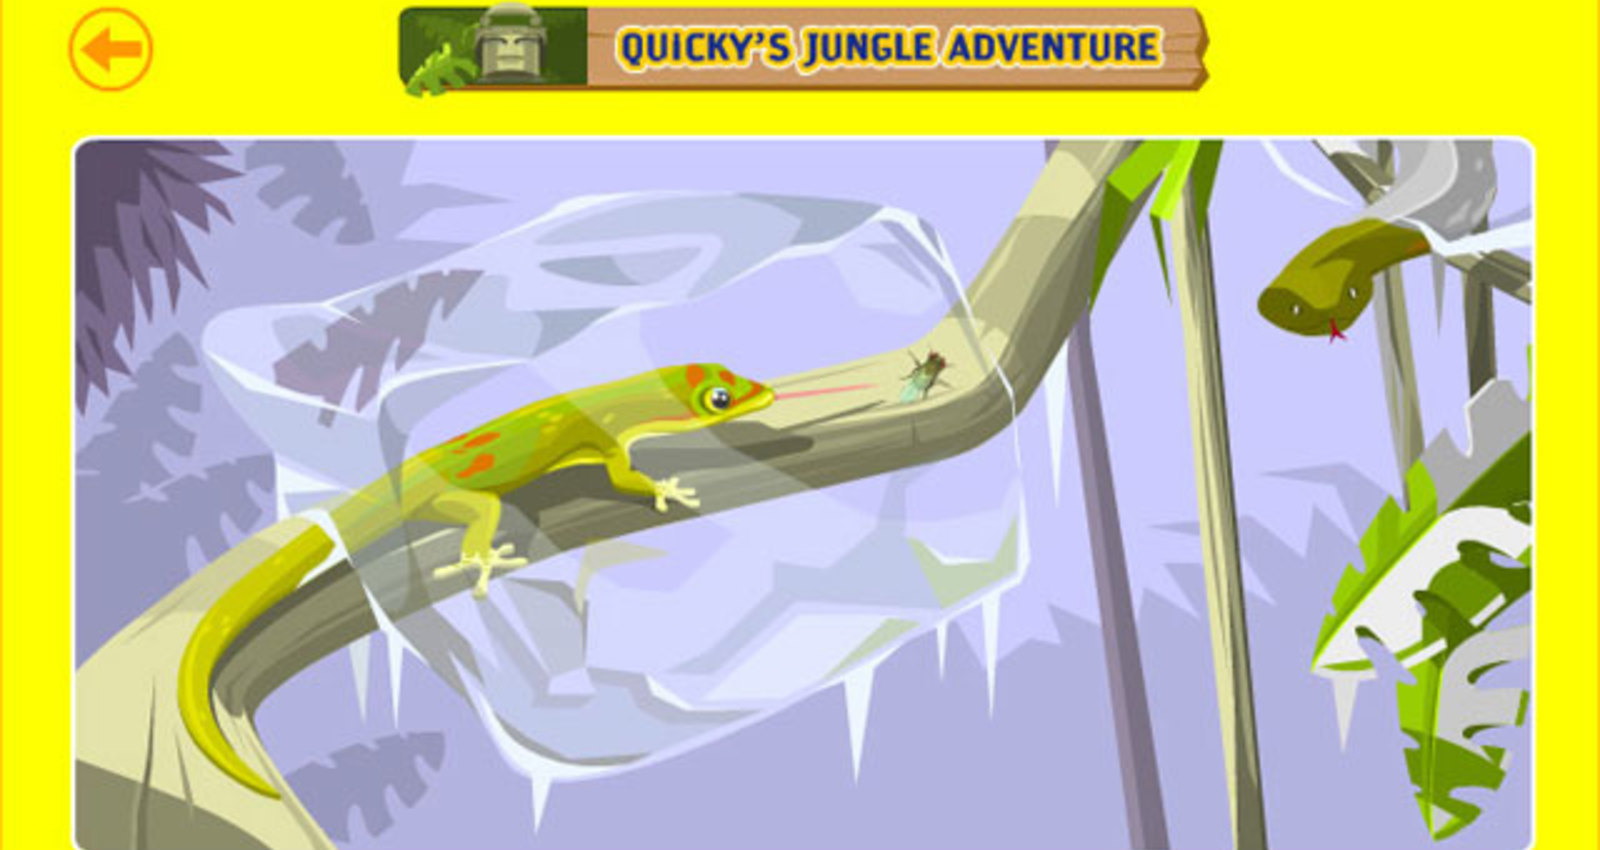 Nesquik Jungle Adventure